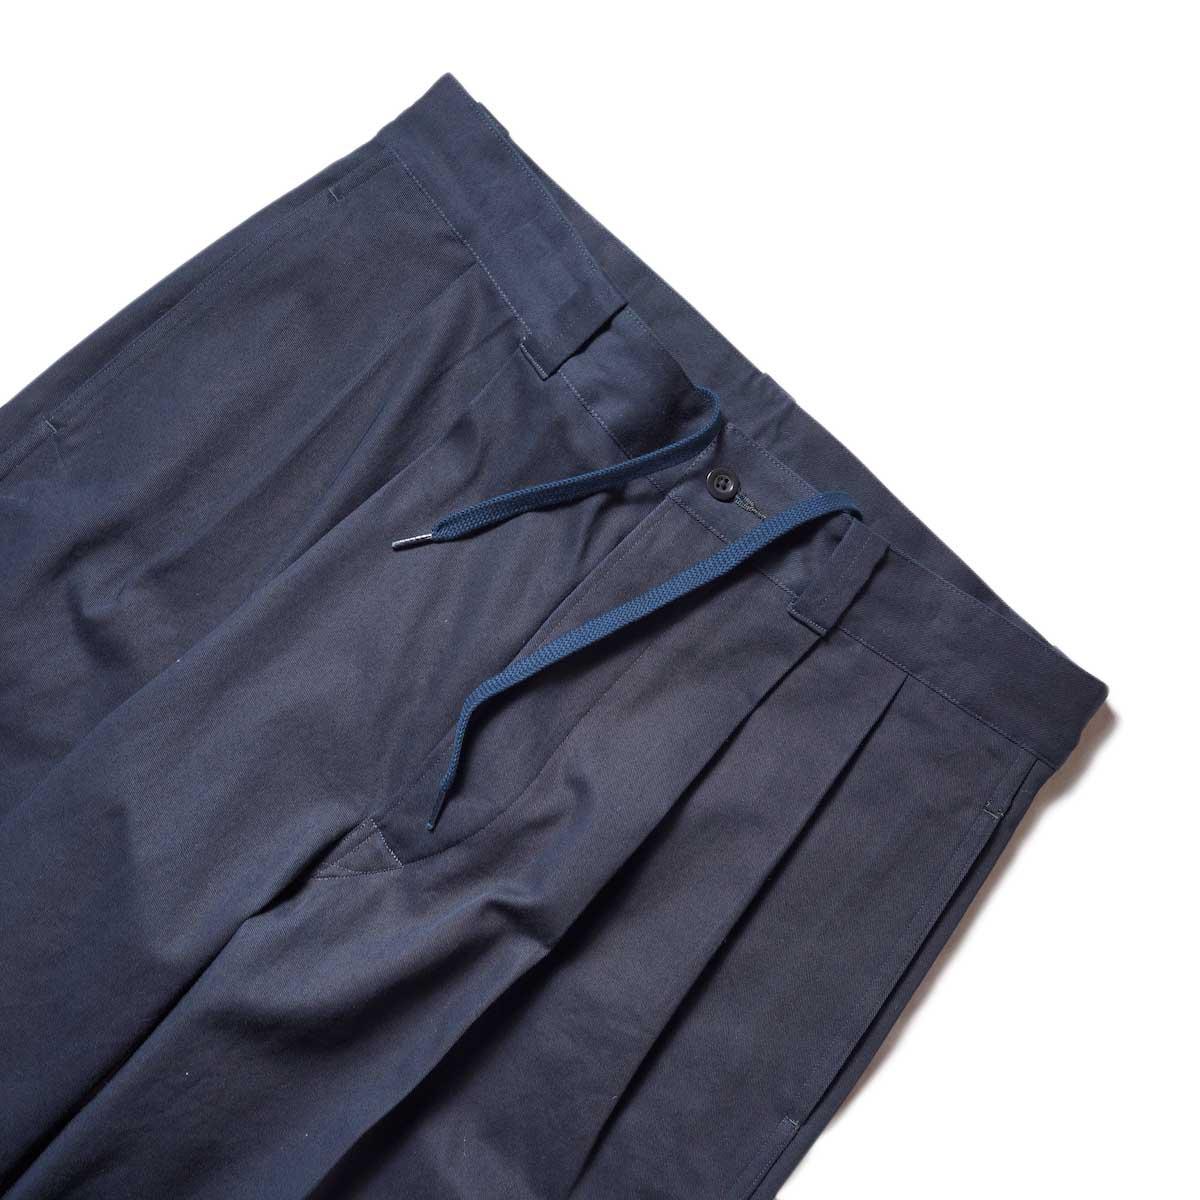 Blurhms / Wool Surge Super Wide Easy Slacks (Khaki Grey)ウエスト、2タック